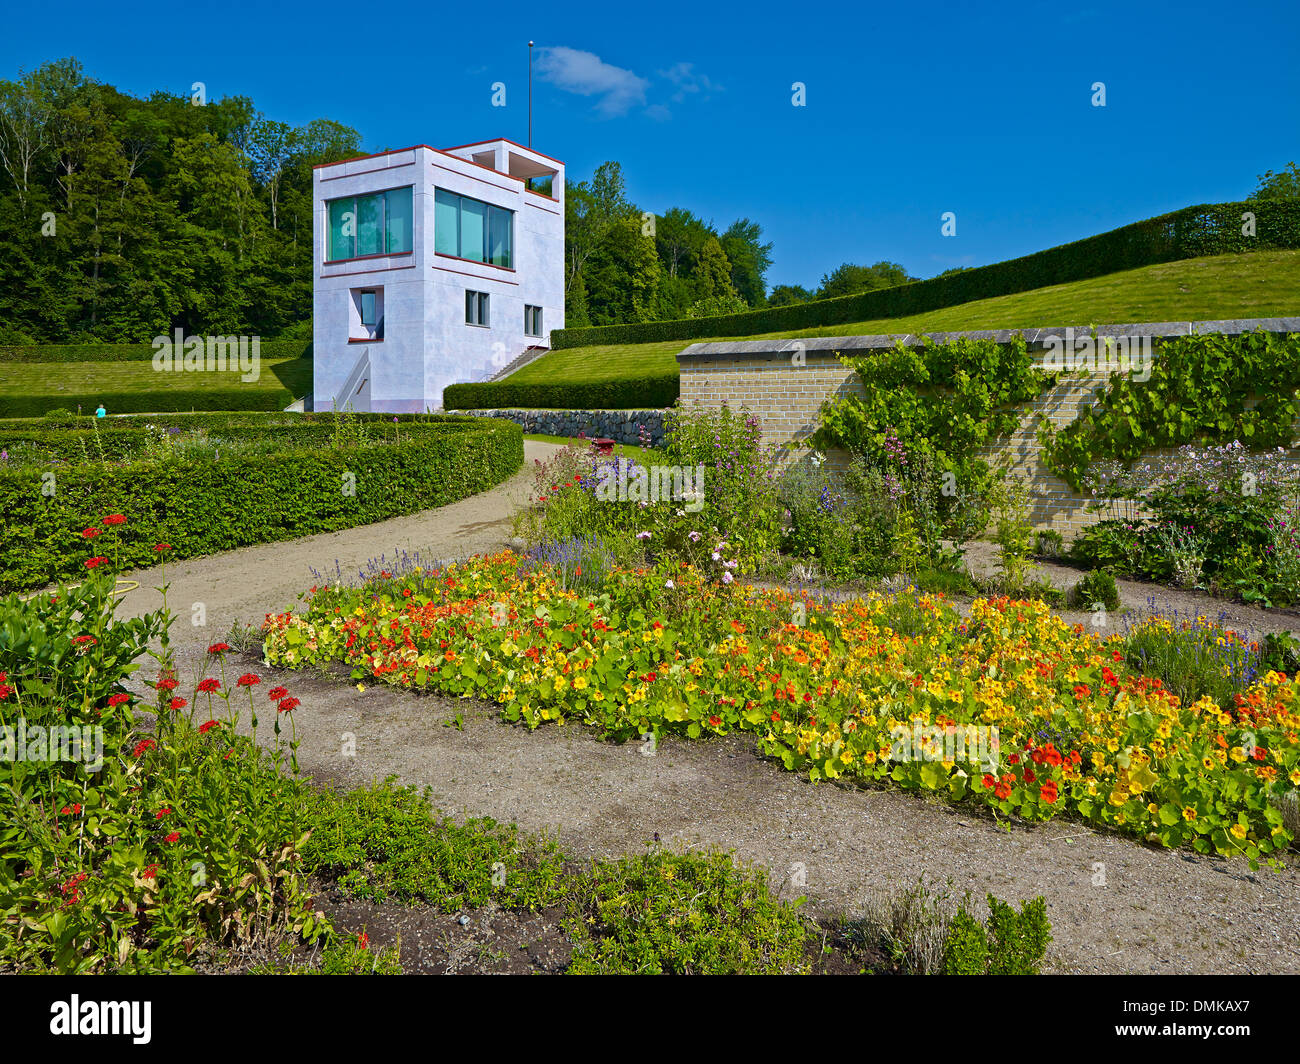 Baroque garden with Globe House in Schleswig, Schleswig-Flensburg District, Schleswig-Holstein, Germany - Stock Image